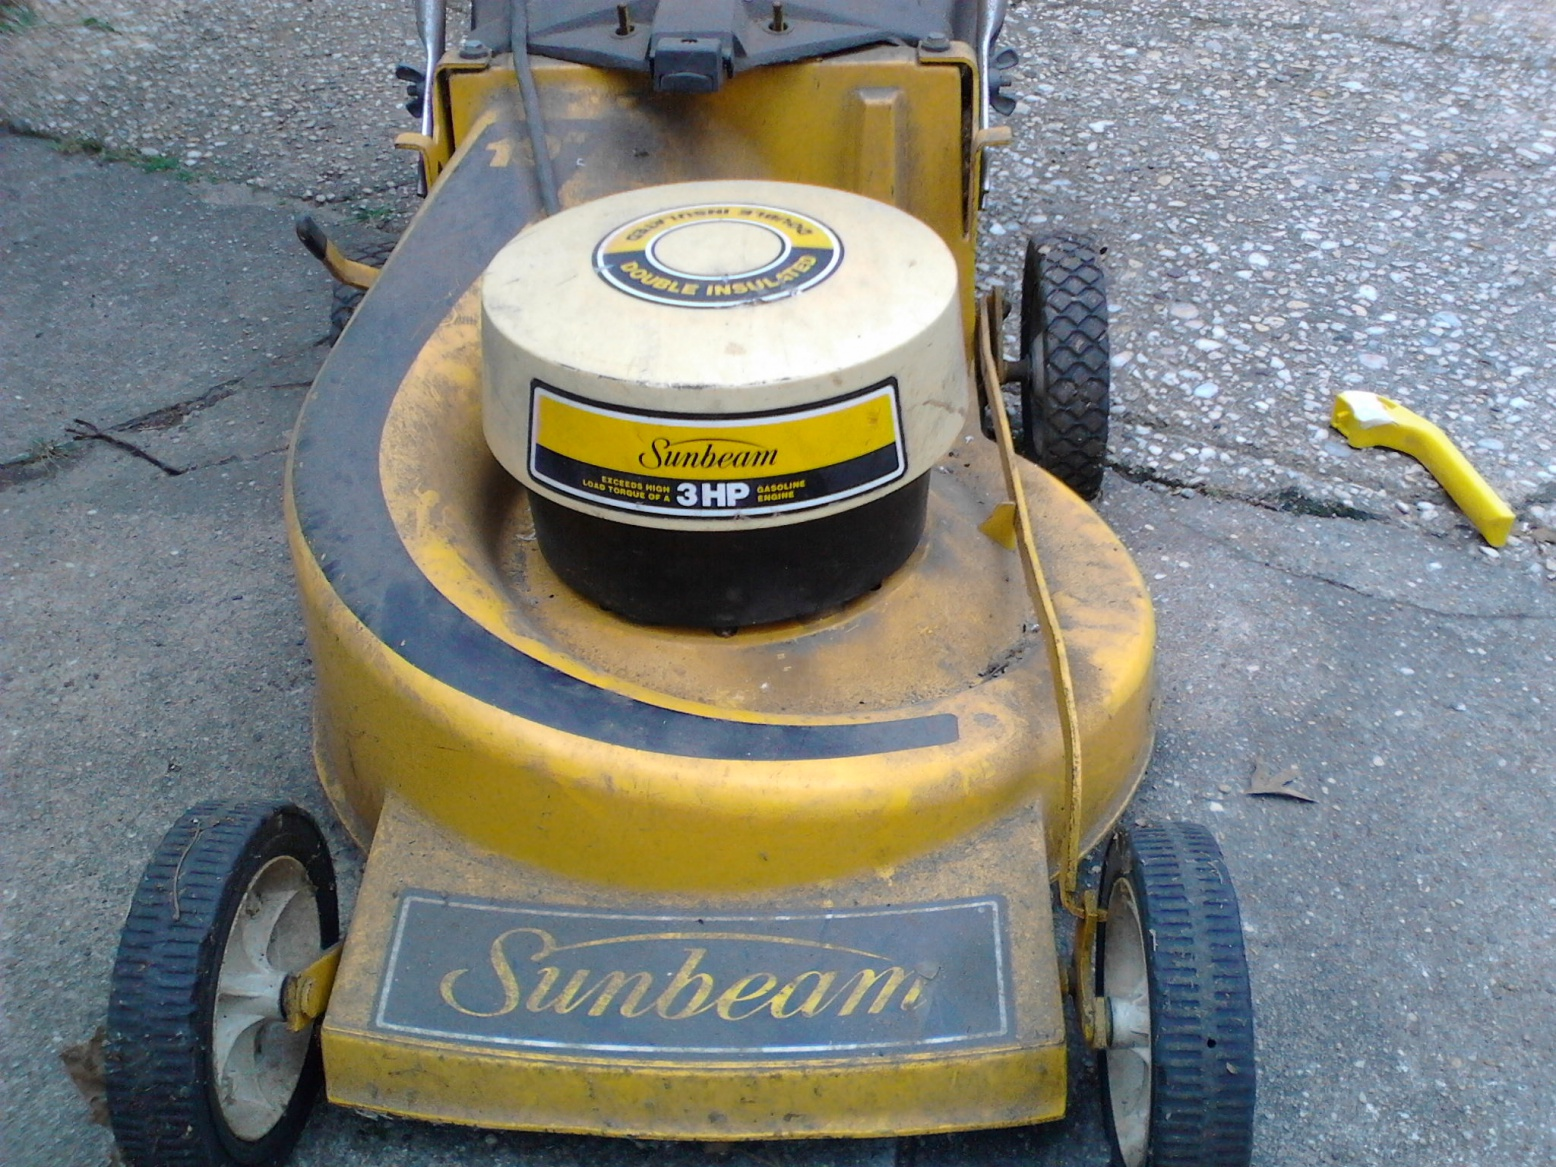 Electric Lawn Mower Motor Problems Impremedia Net